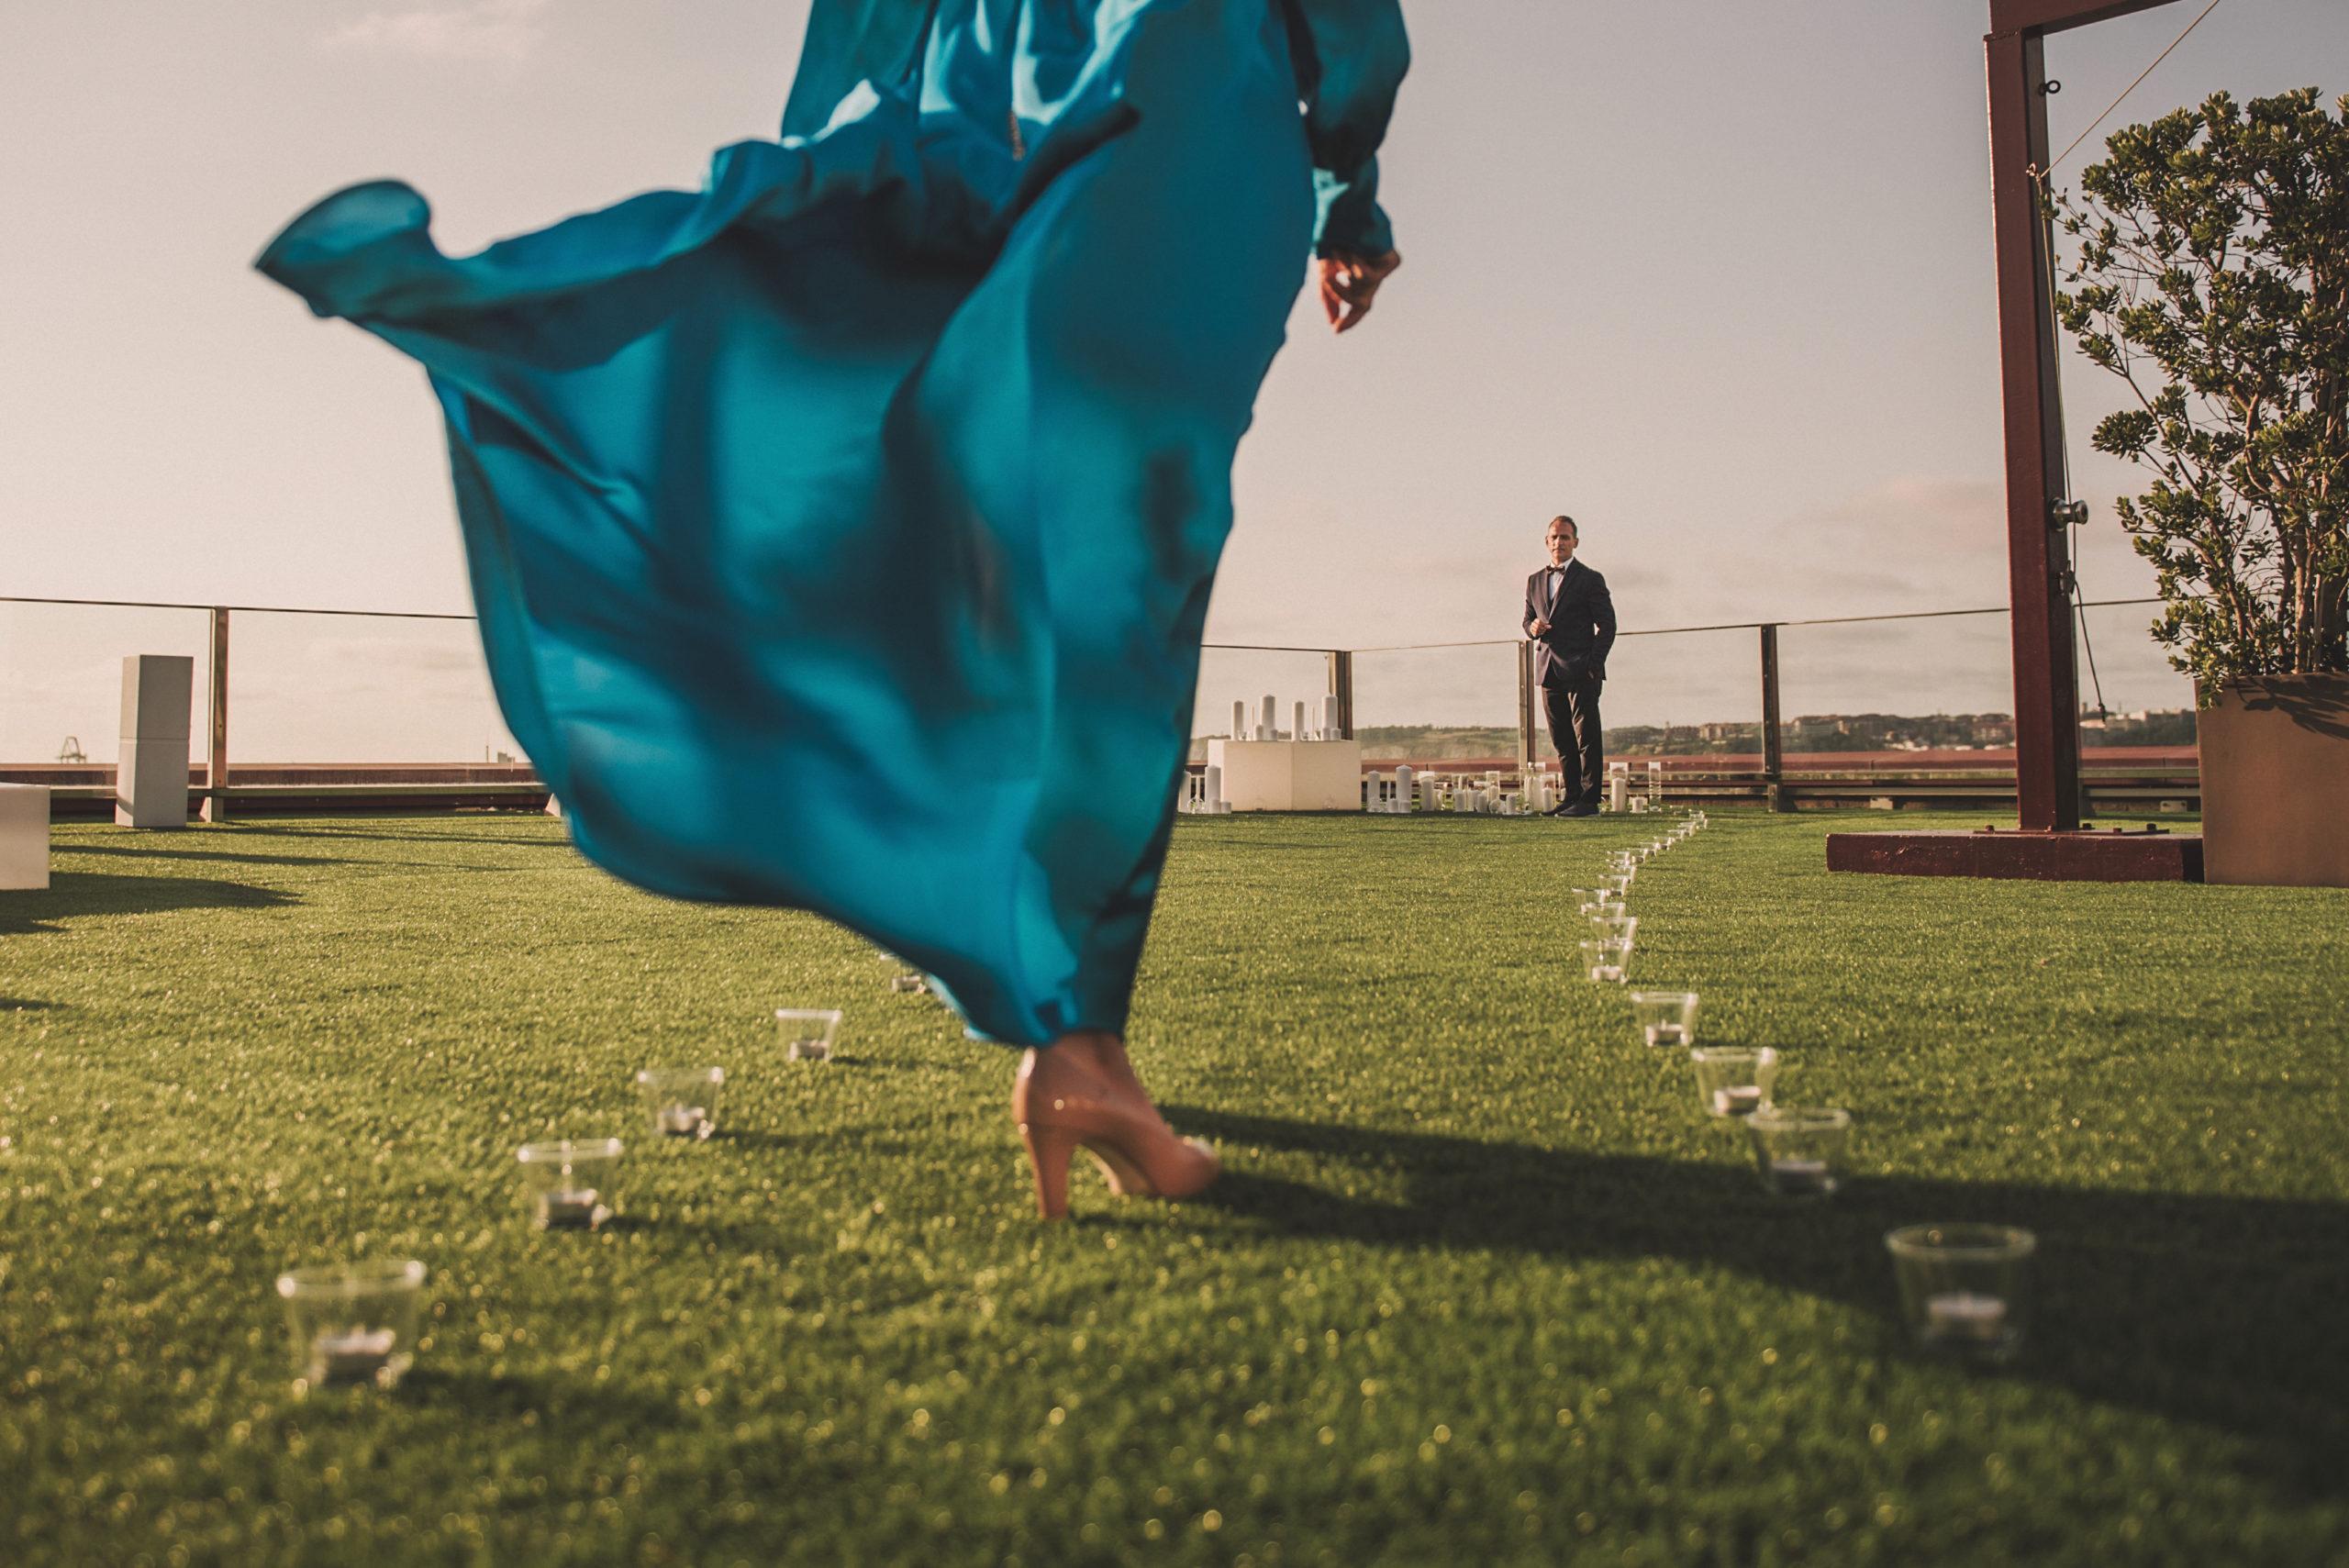 Vestido de novia azul pasando por pasillo de velas hasta llegar al novio